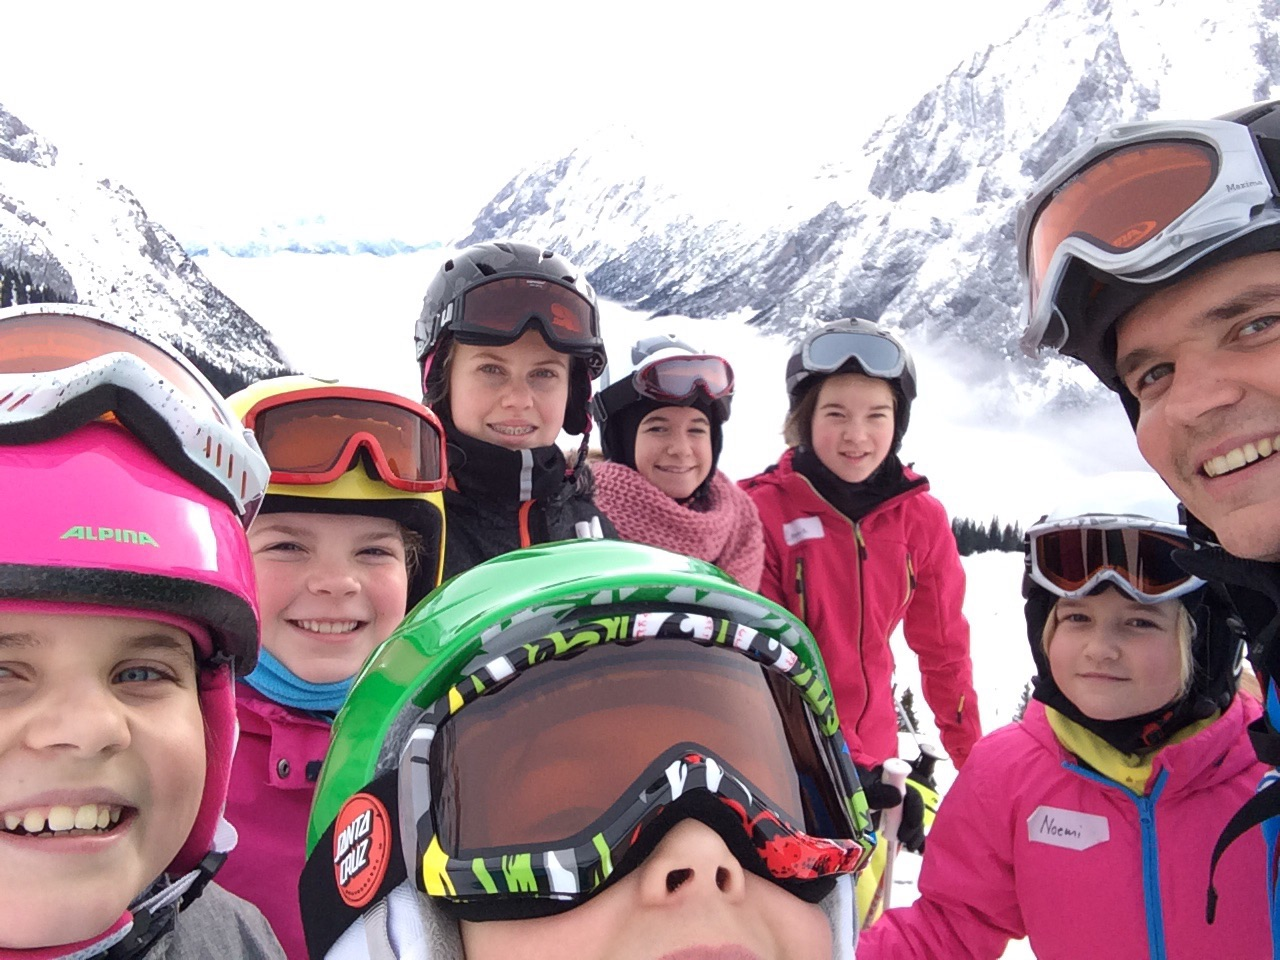 Kurs: Ski, Snowboard, Schneeschuhwandern & Langlauf